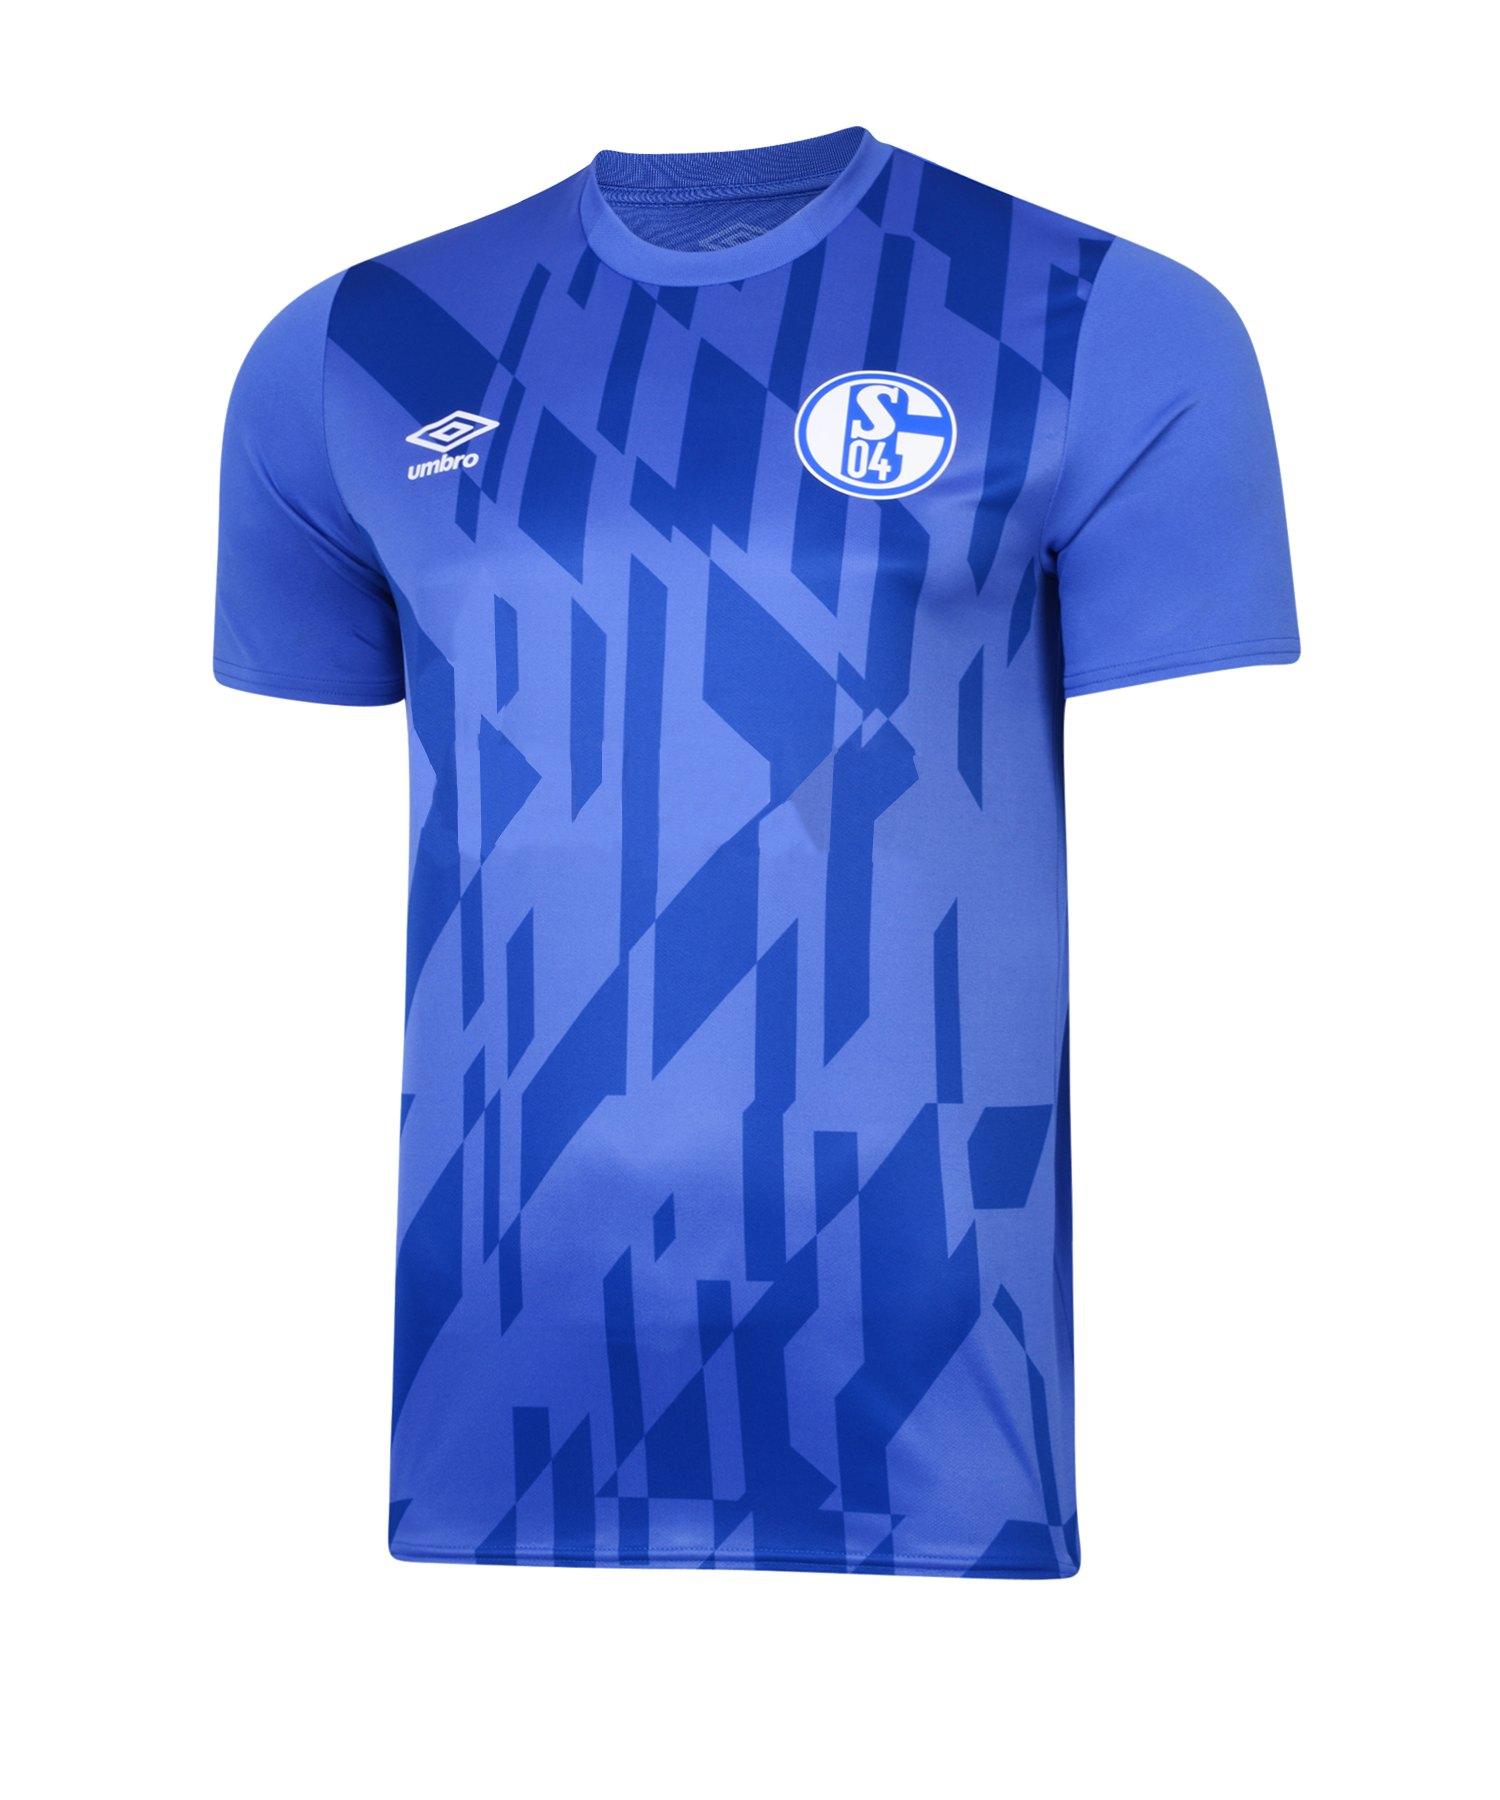 Umbro FC Schalke 04 Jersey Warm Up T-Shirt F71N - blau